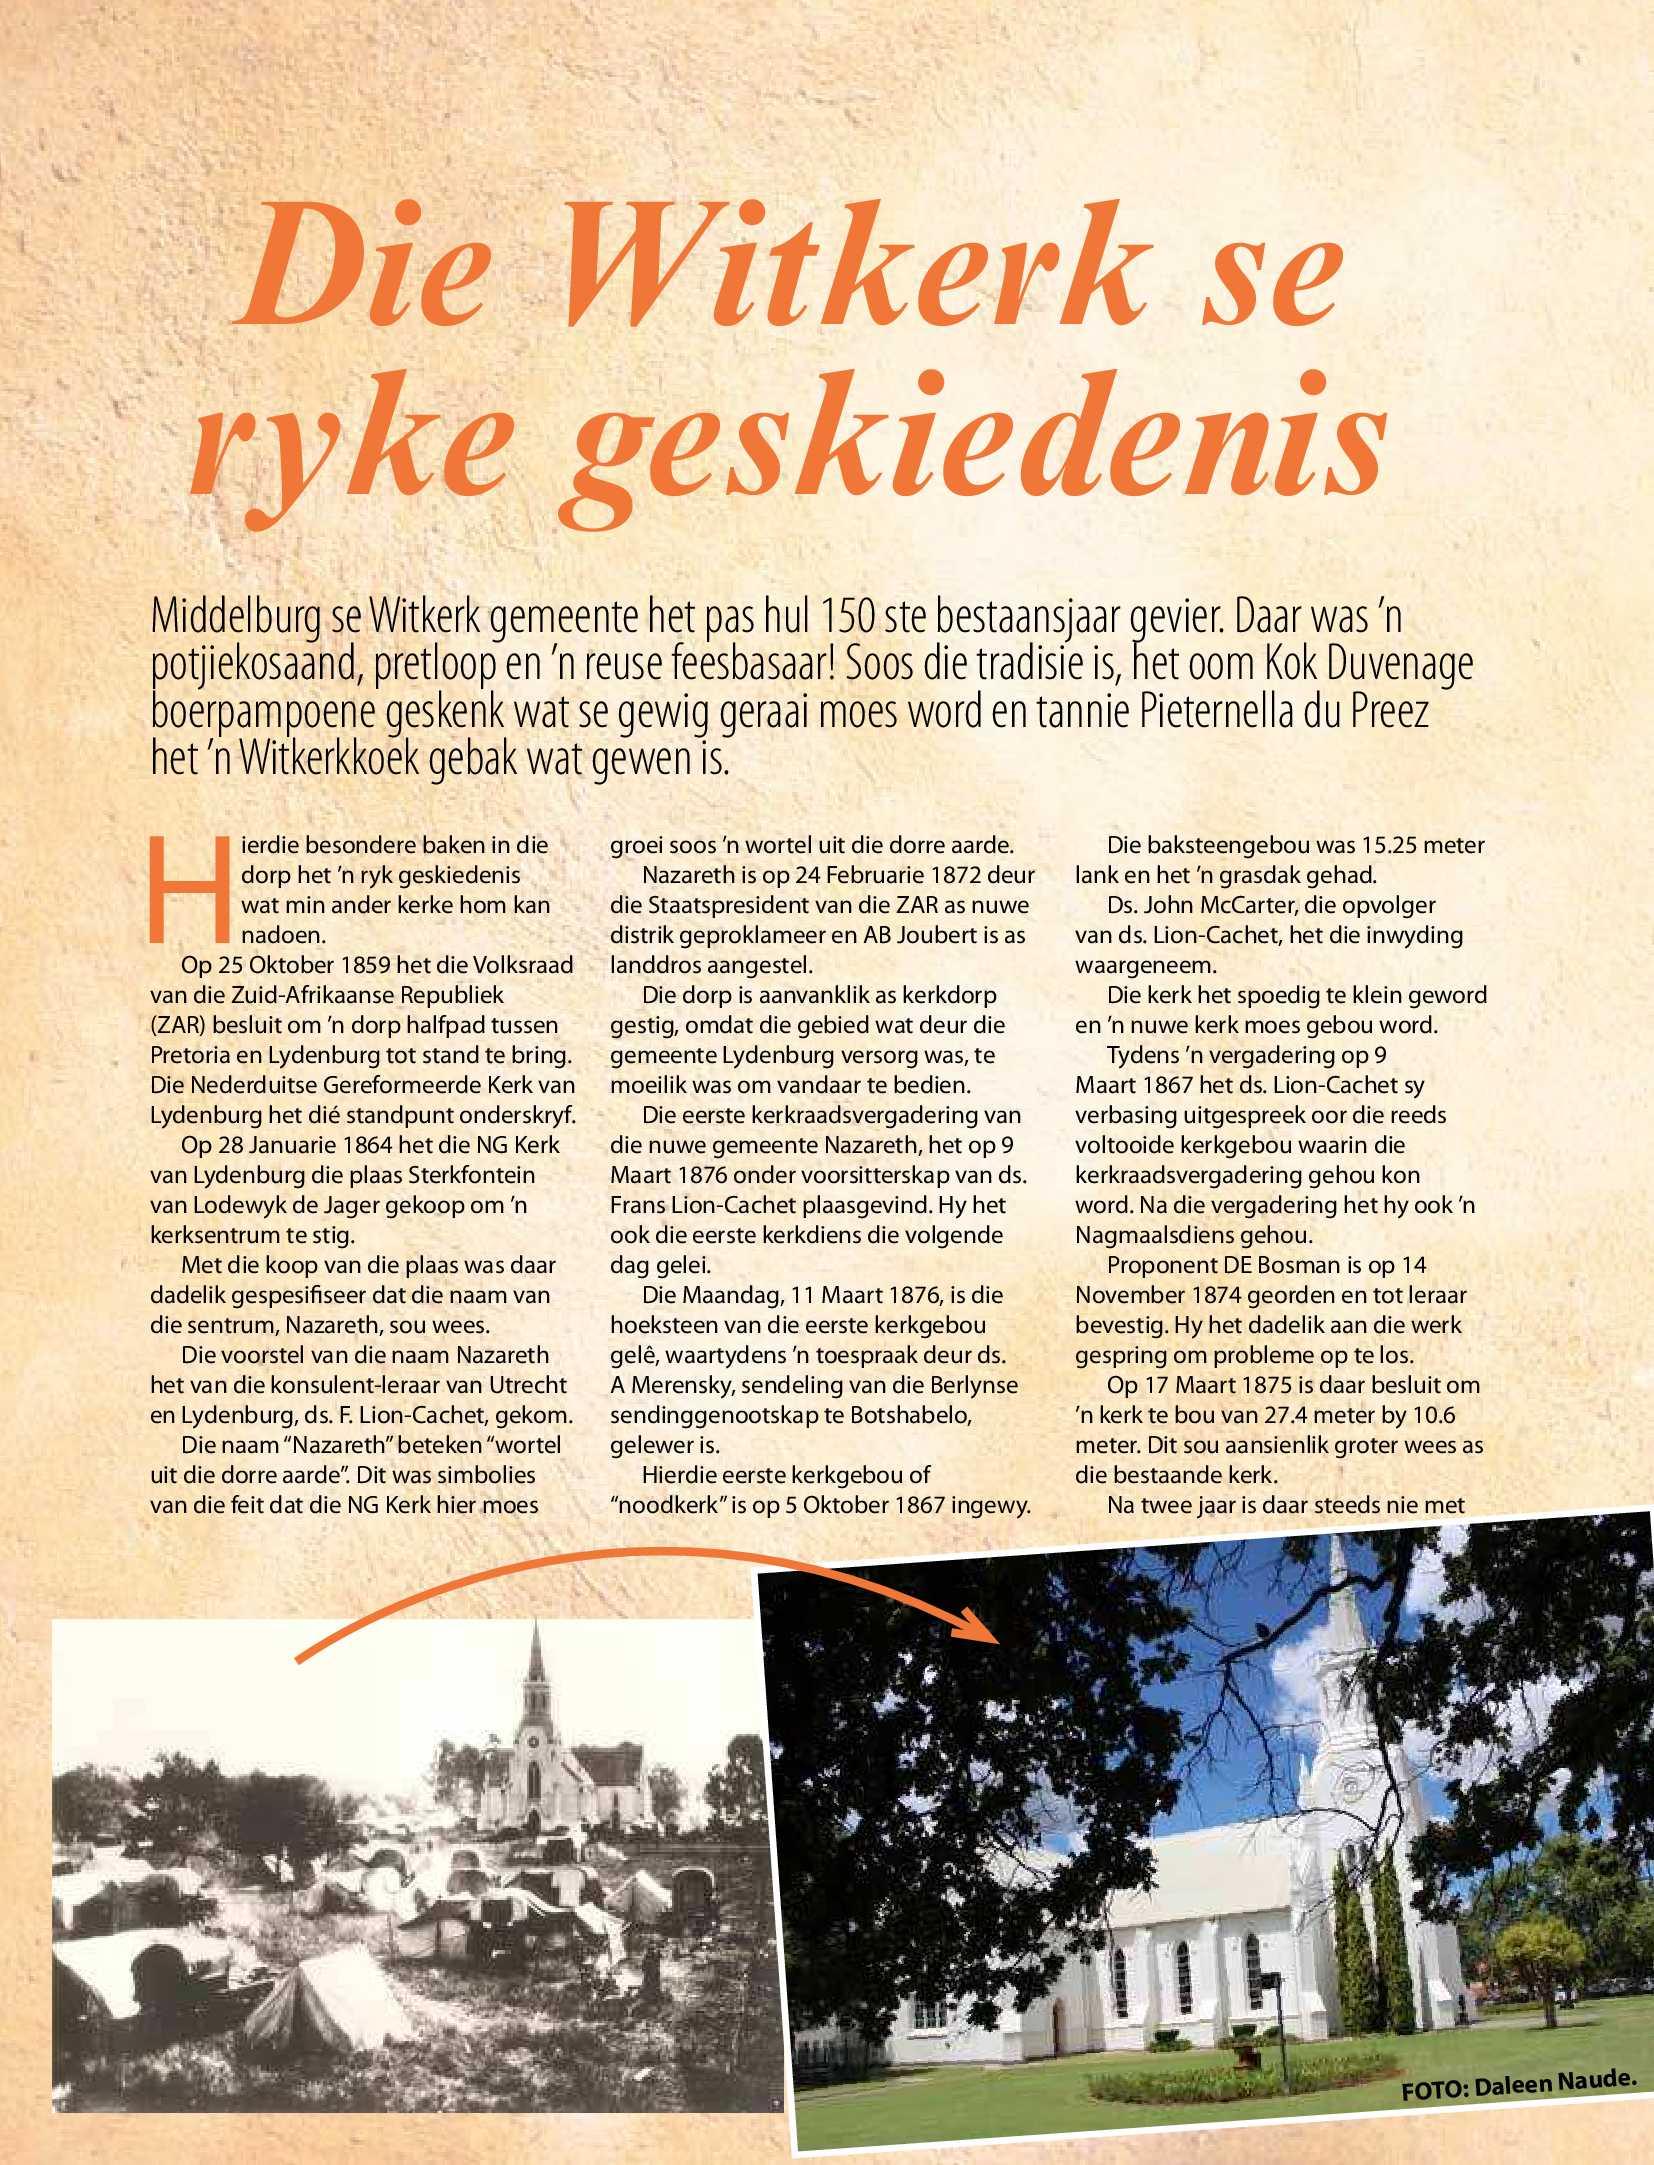 get-middelburg-april-2017-epapers-page-20